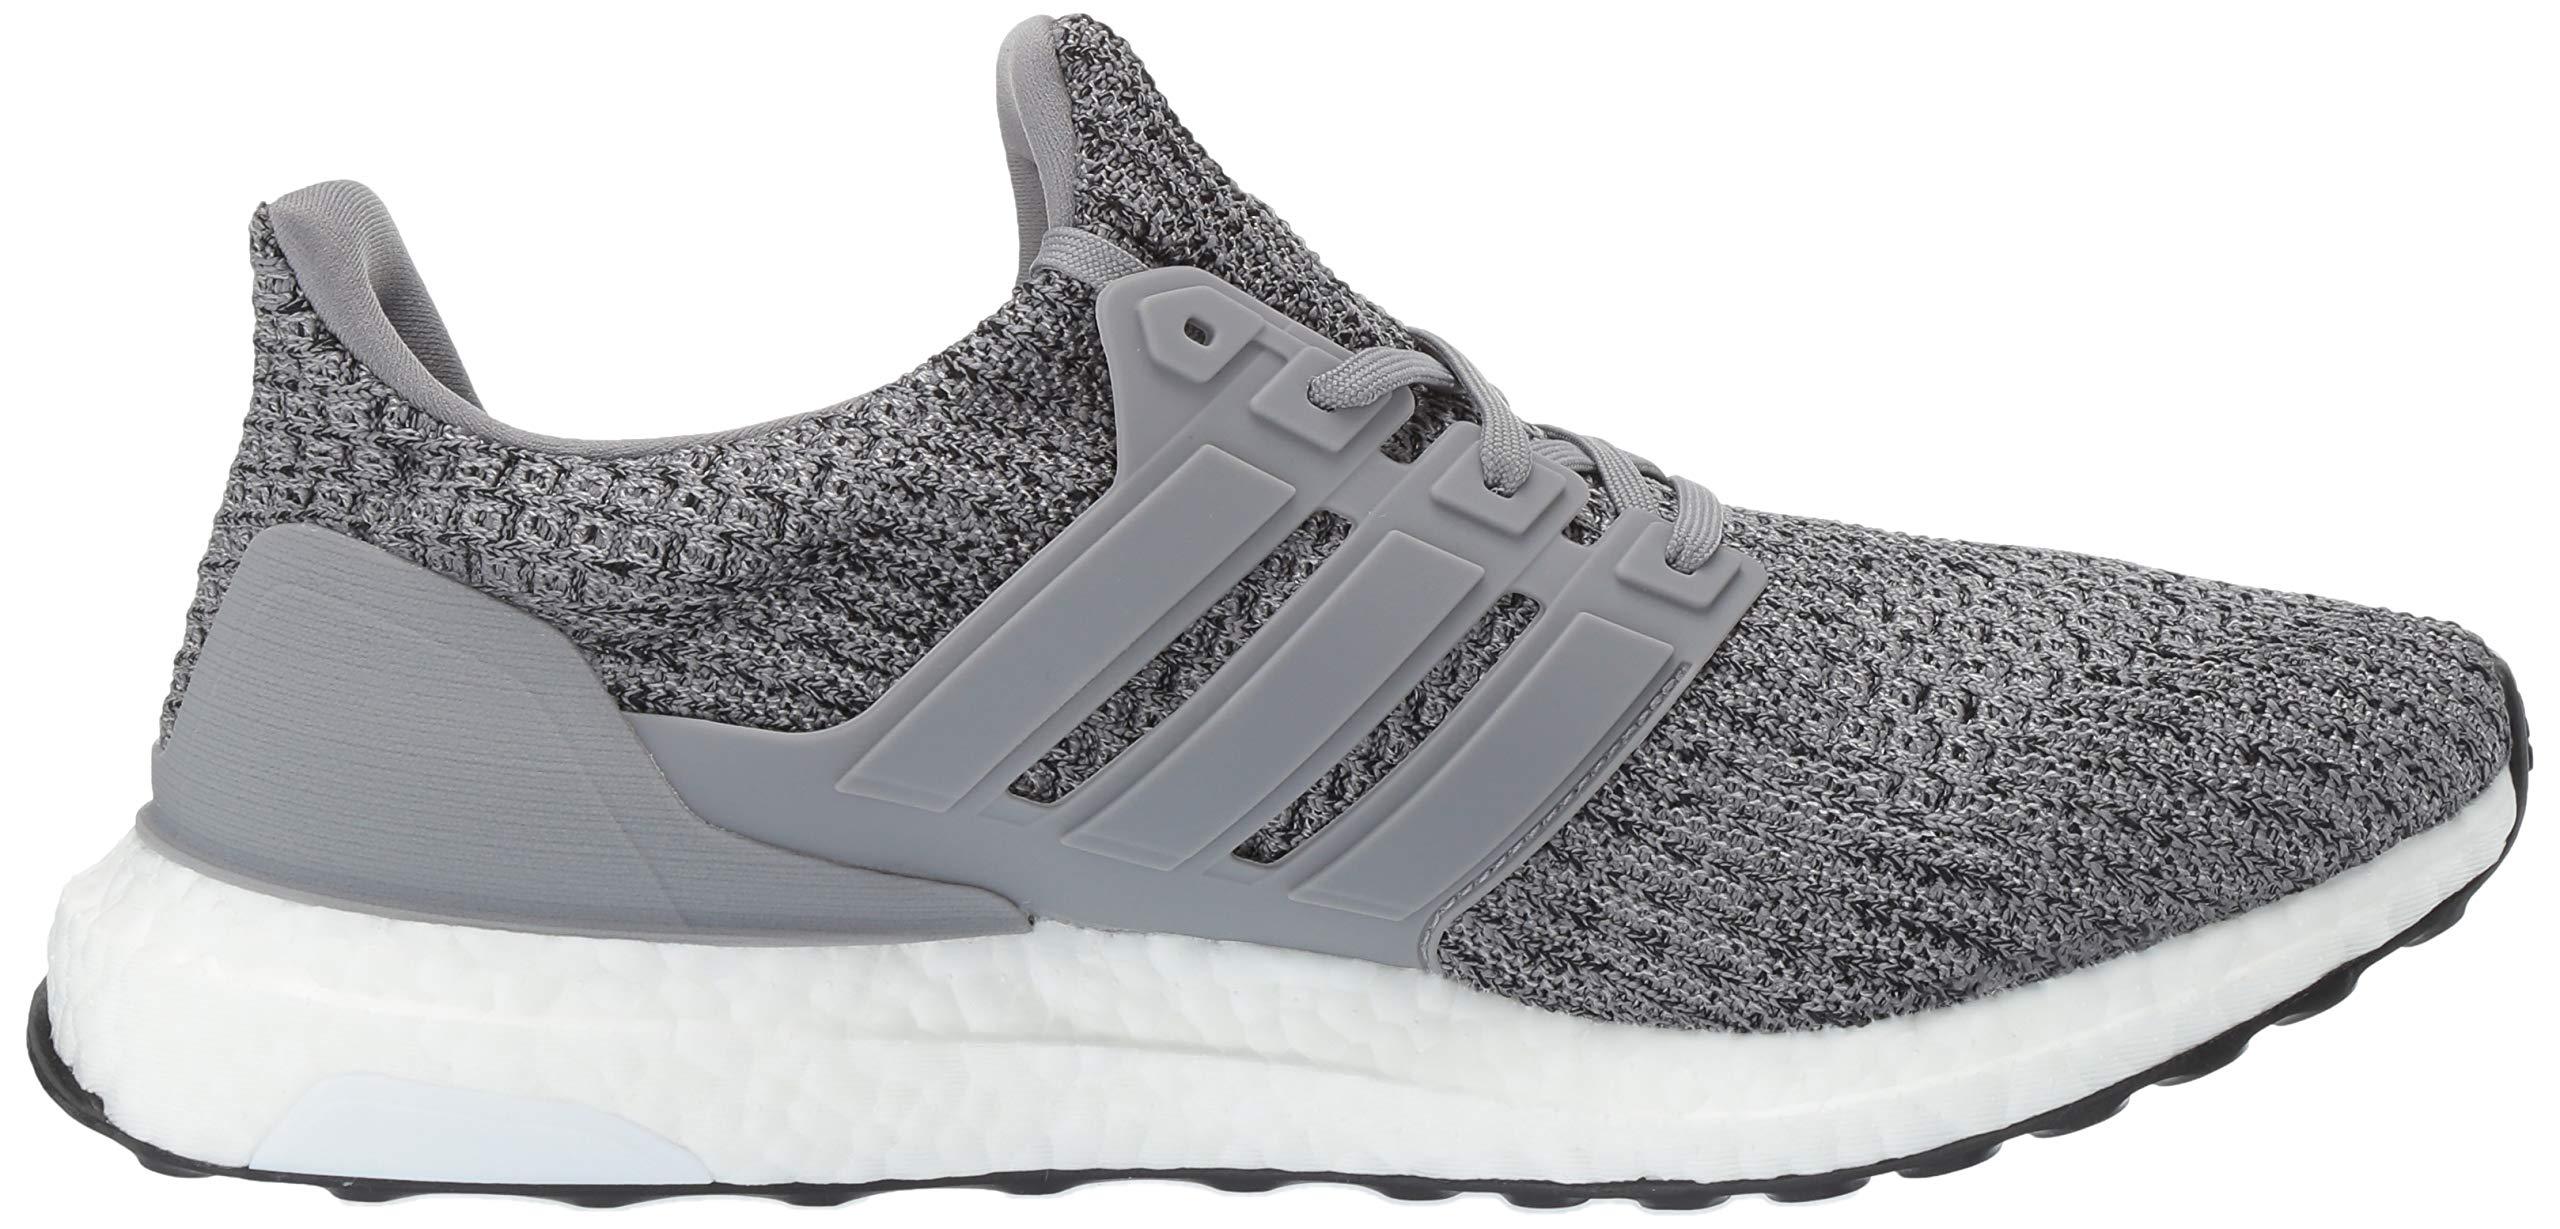 adidas Men's Ultraboost, Grey/Black, 4 M US by adidas (Image #7)